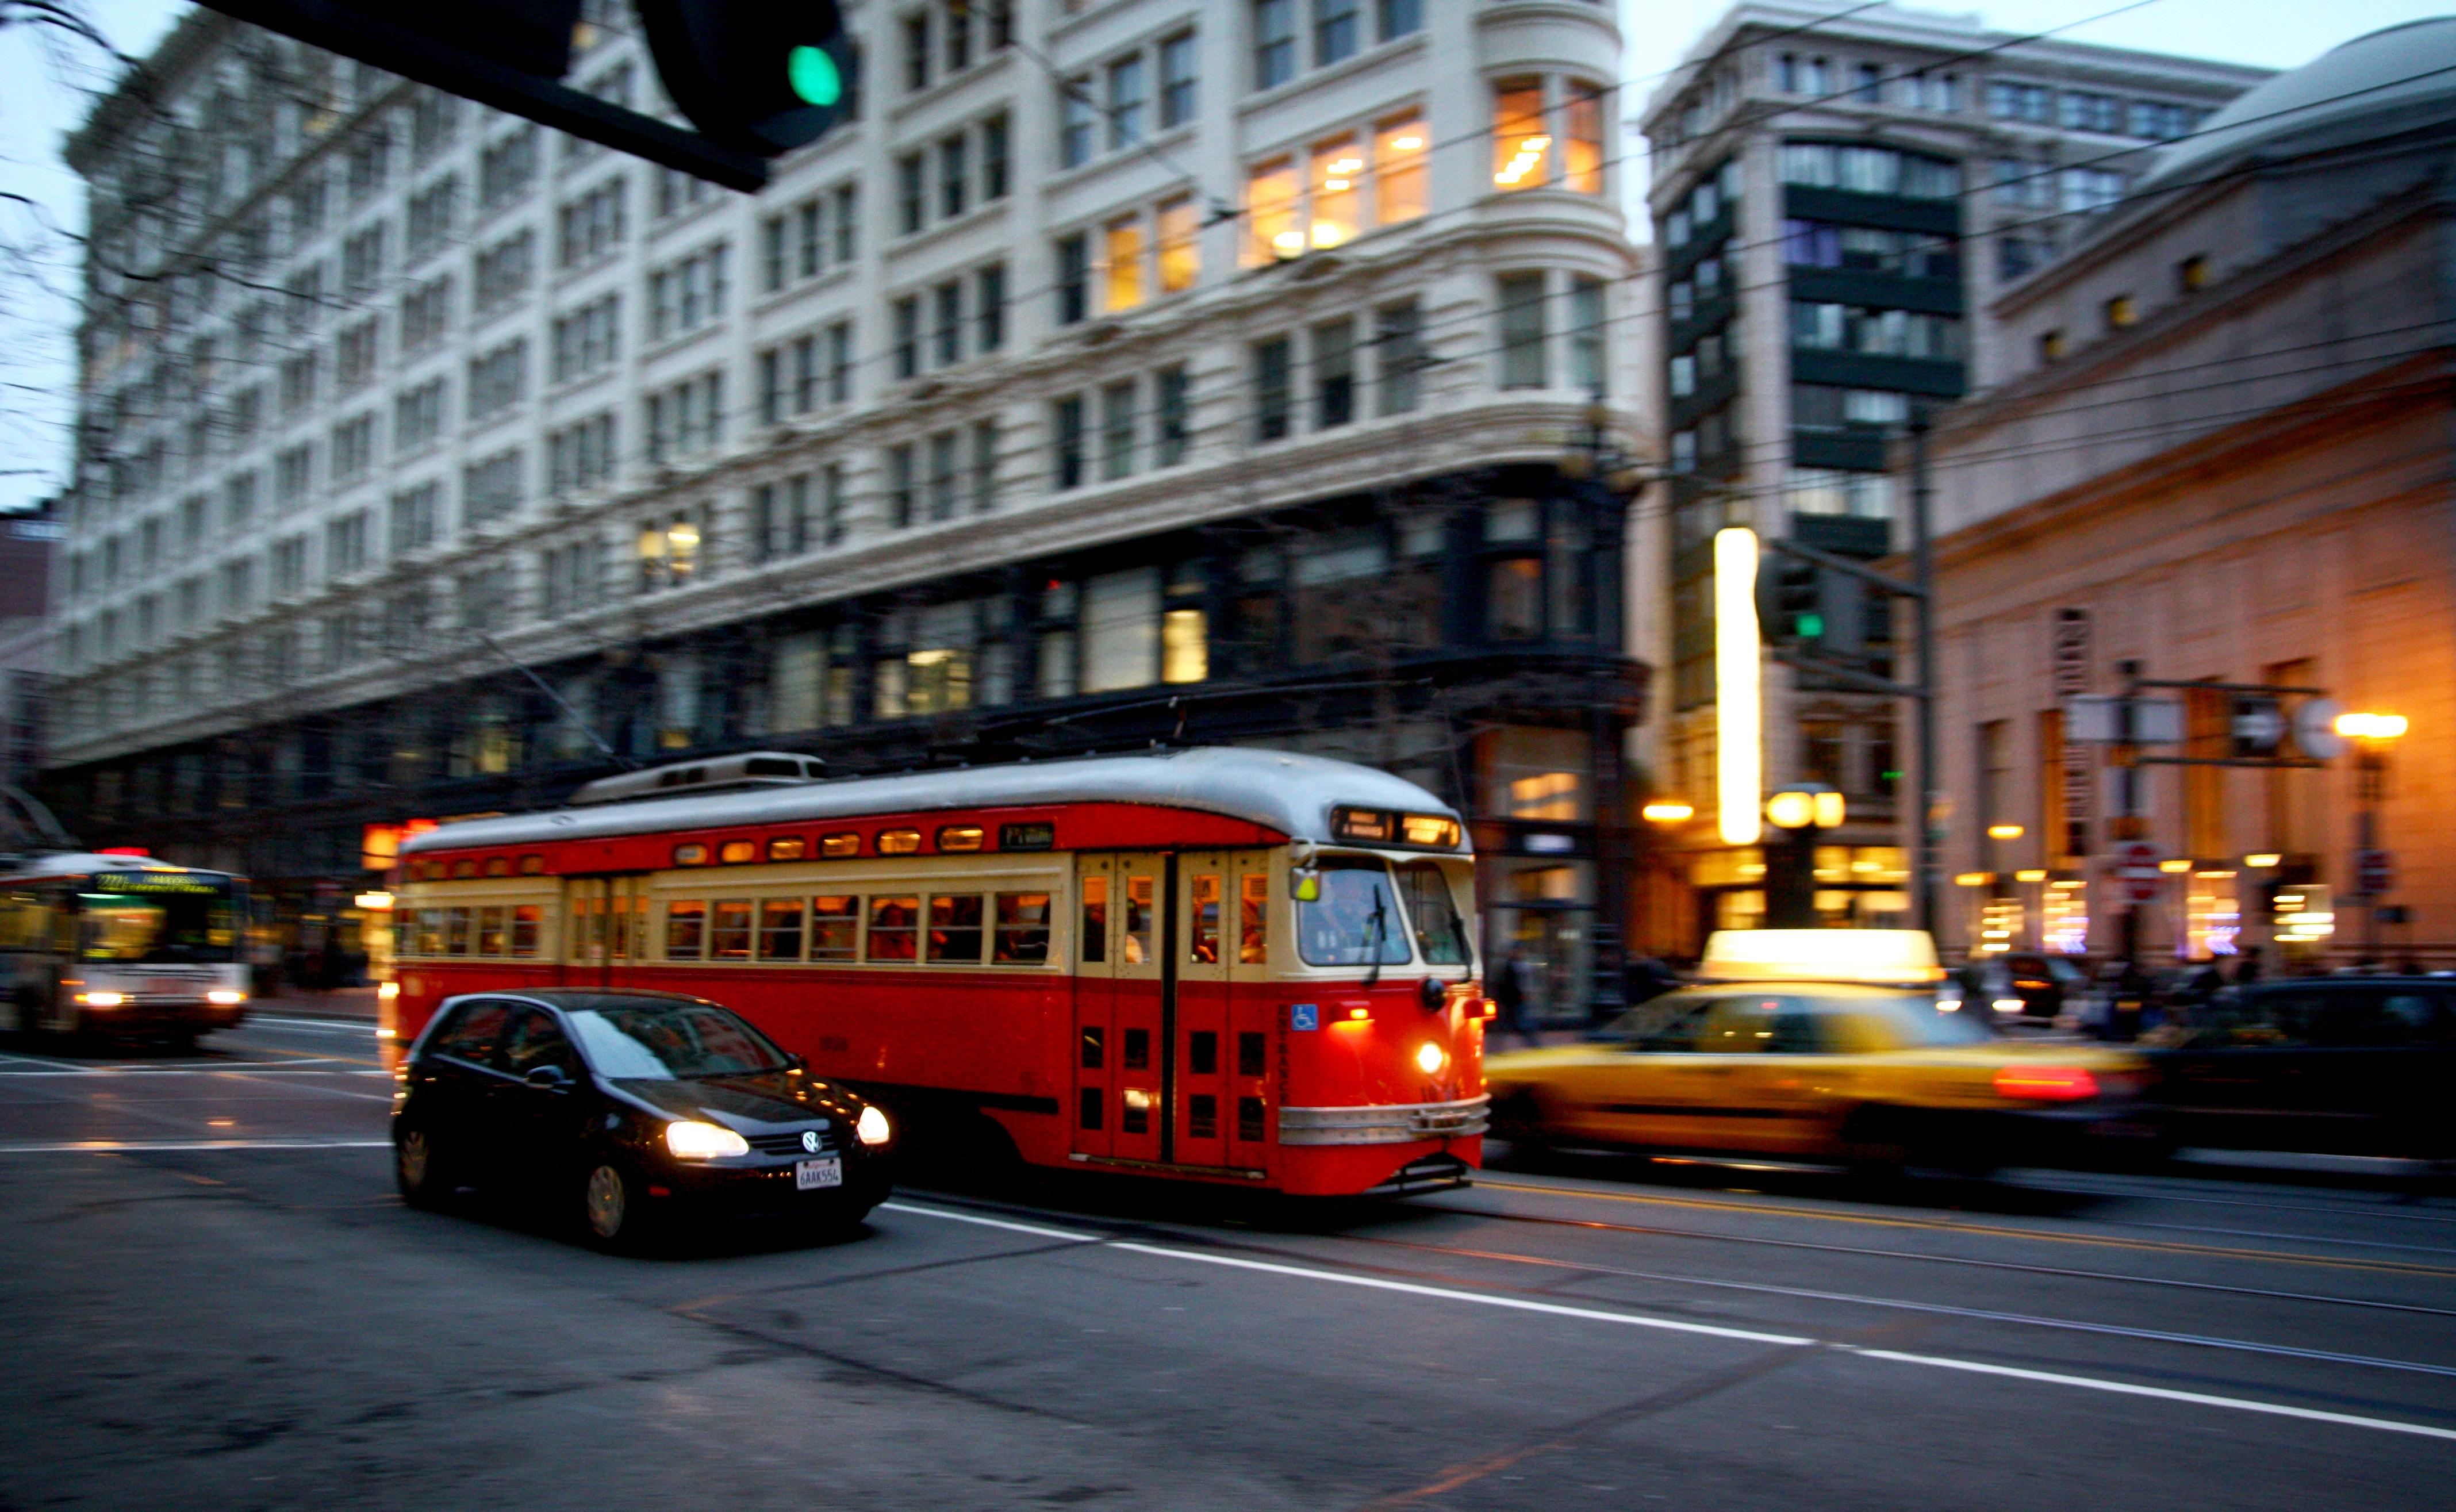 bus near black building